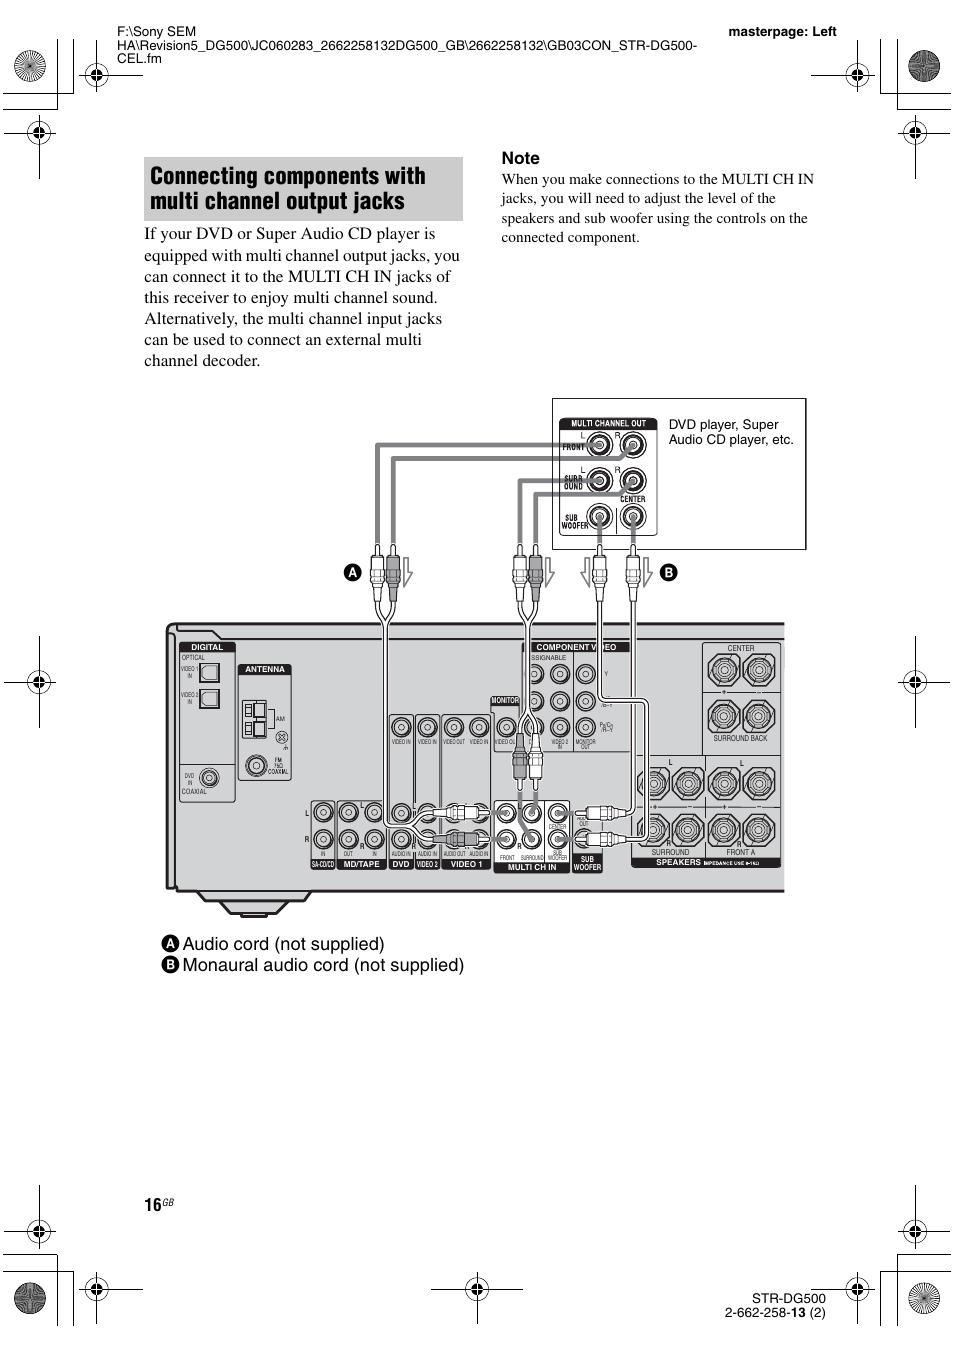 dvd player super audio cd player etc sony str dg500 user manual rh manualsdir com 6.1 Channel Receiver Sony STR- DG520